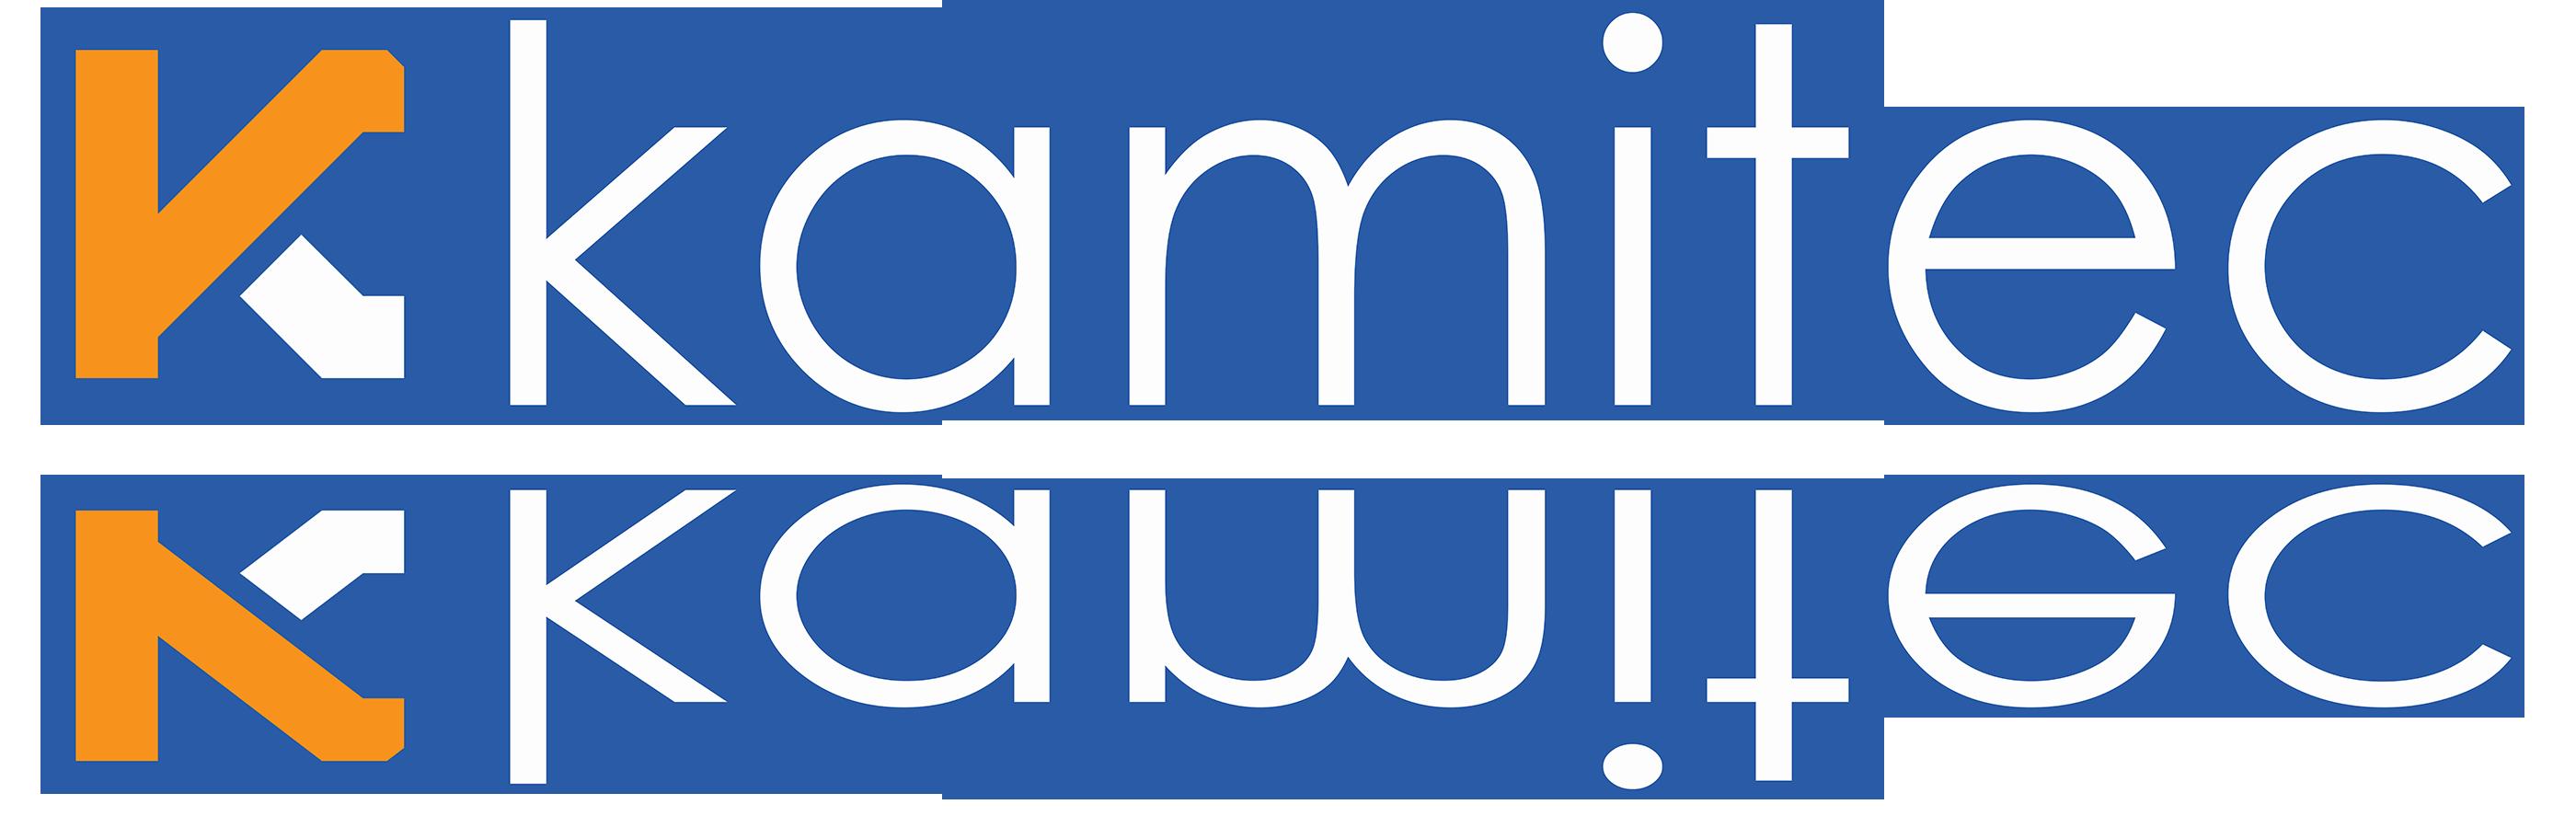 kamitec Informatique